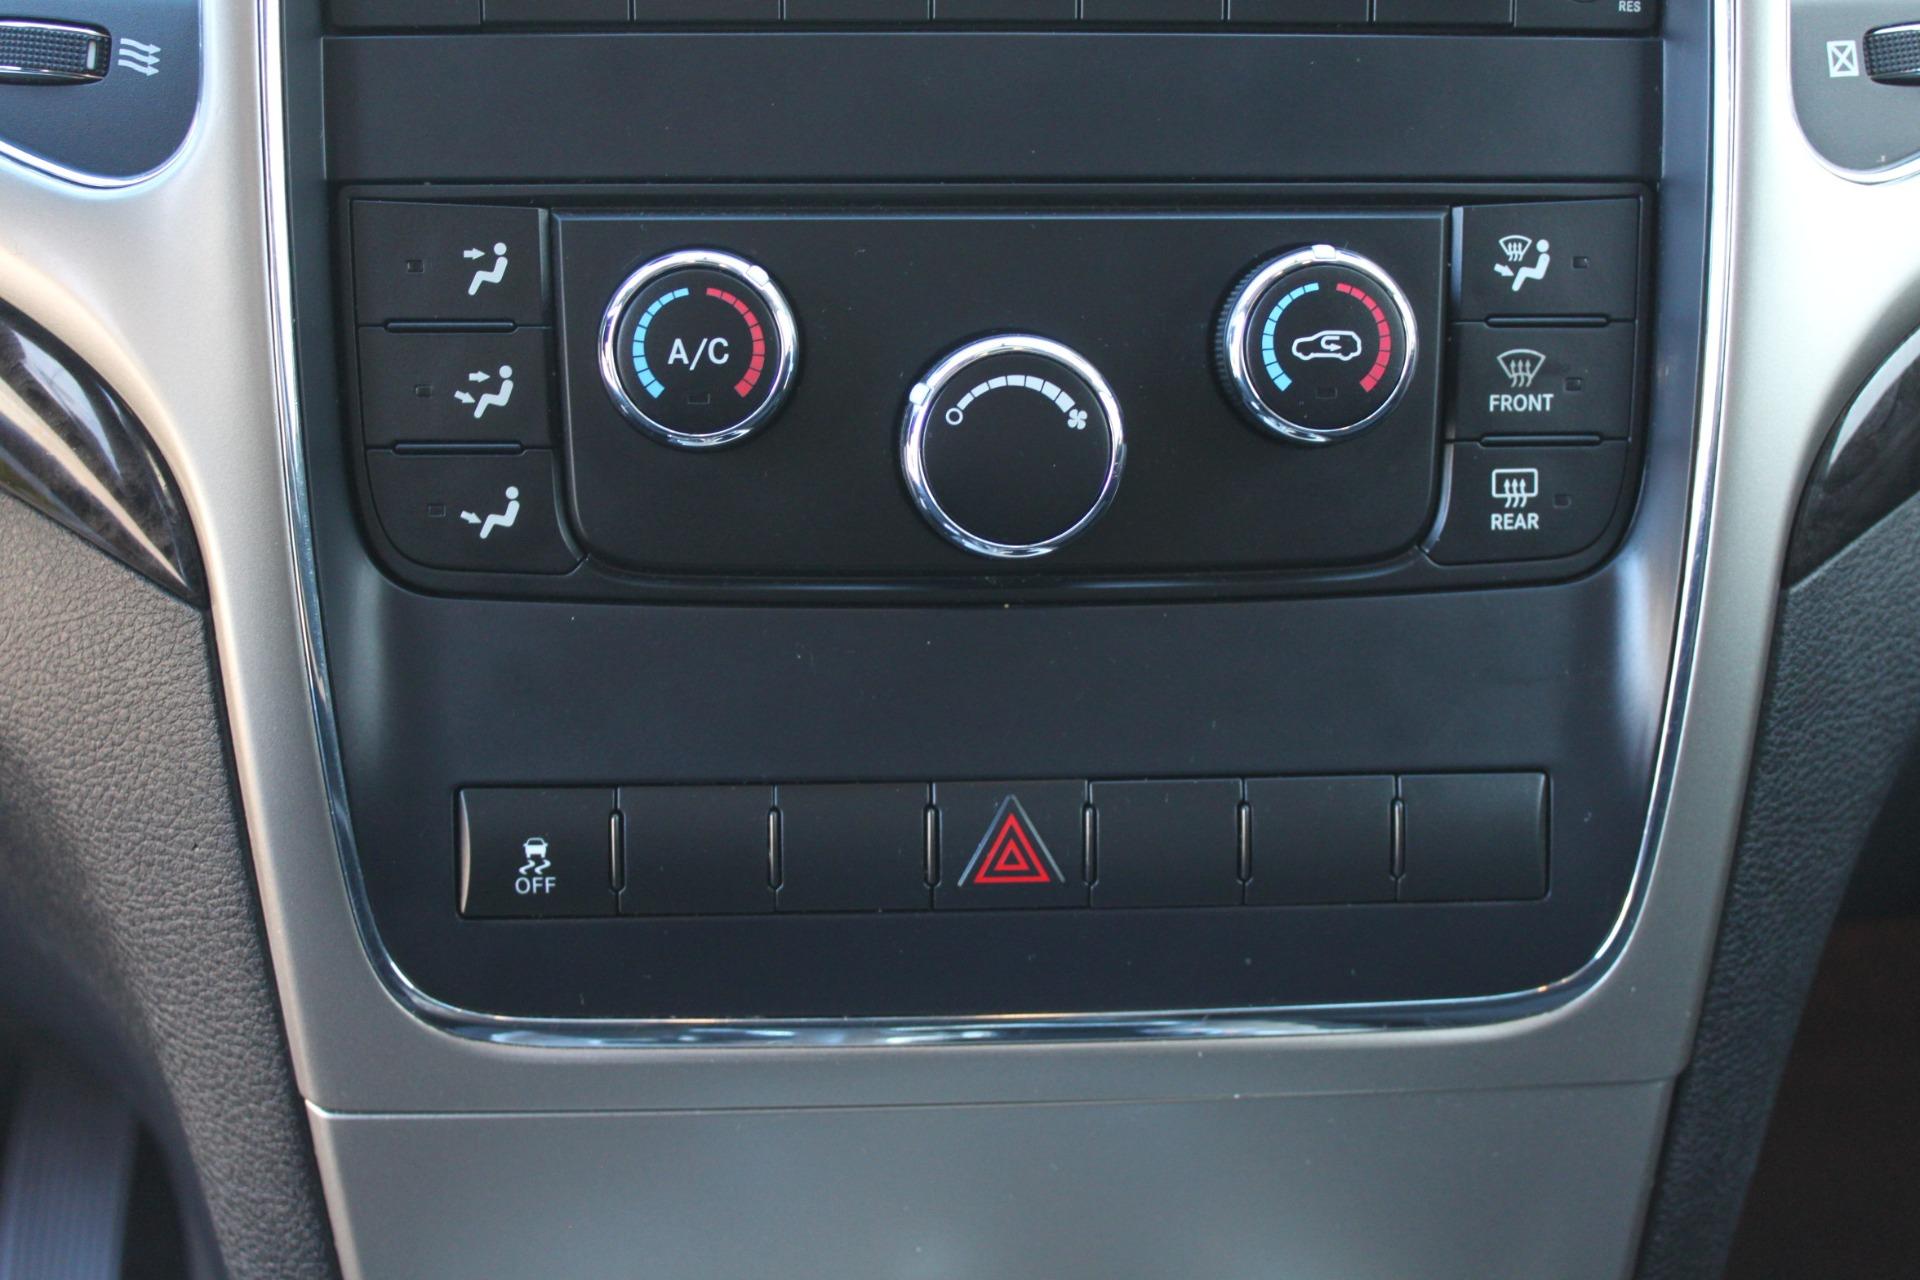 Used-2011-Jeep-Grand-Cherokee-Laredo-Land-Rover